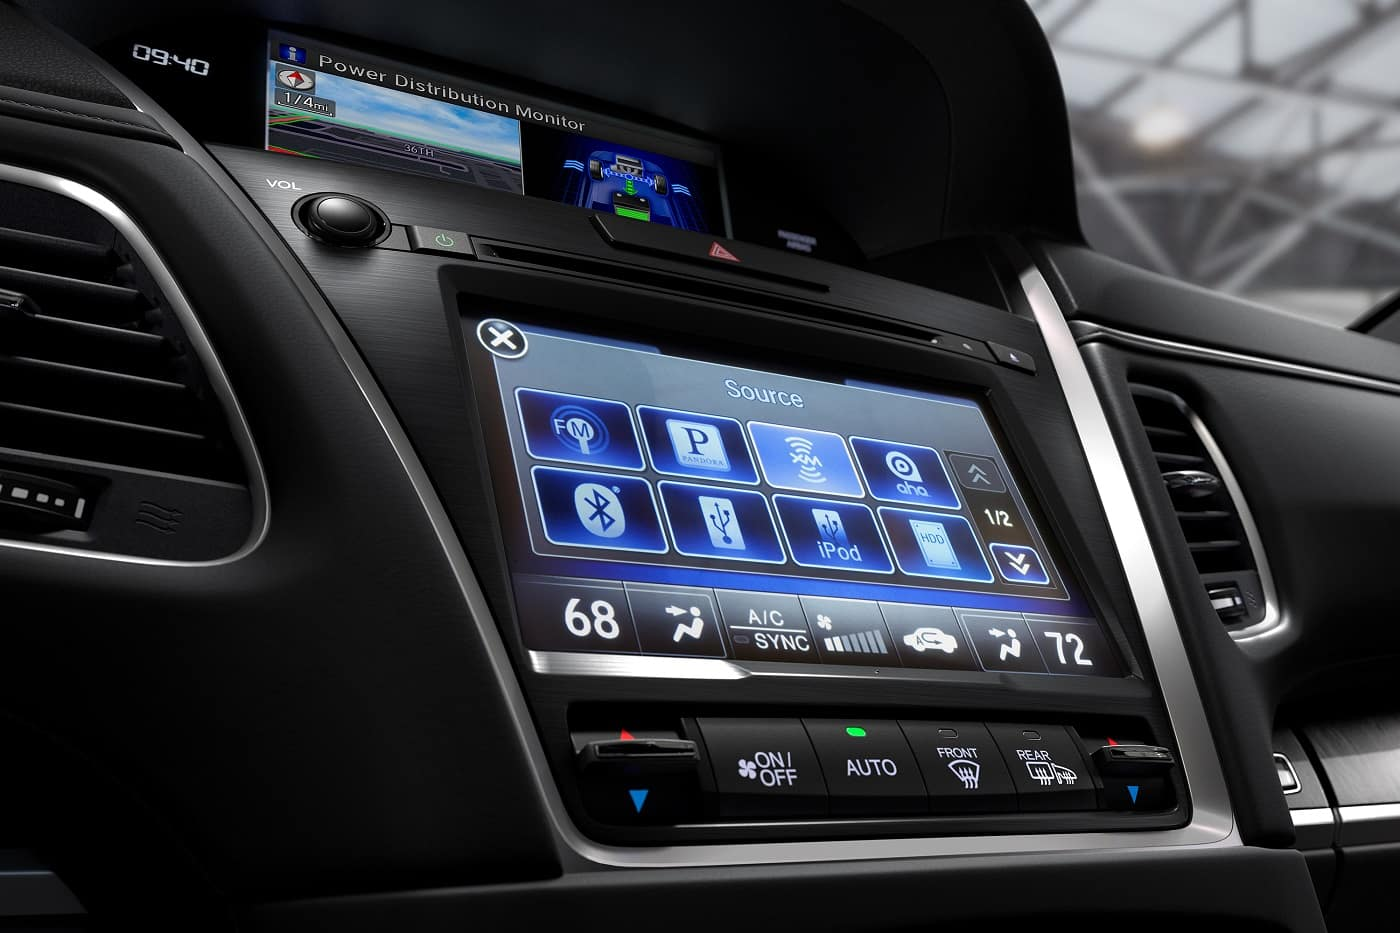 Acura RLX Infotainment